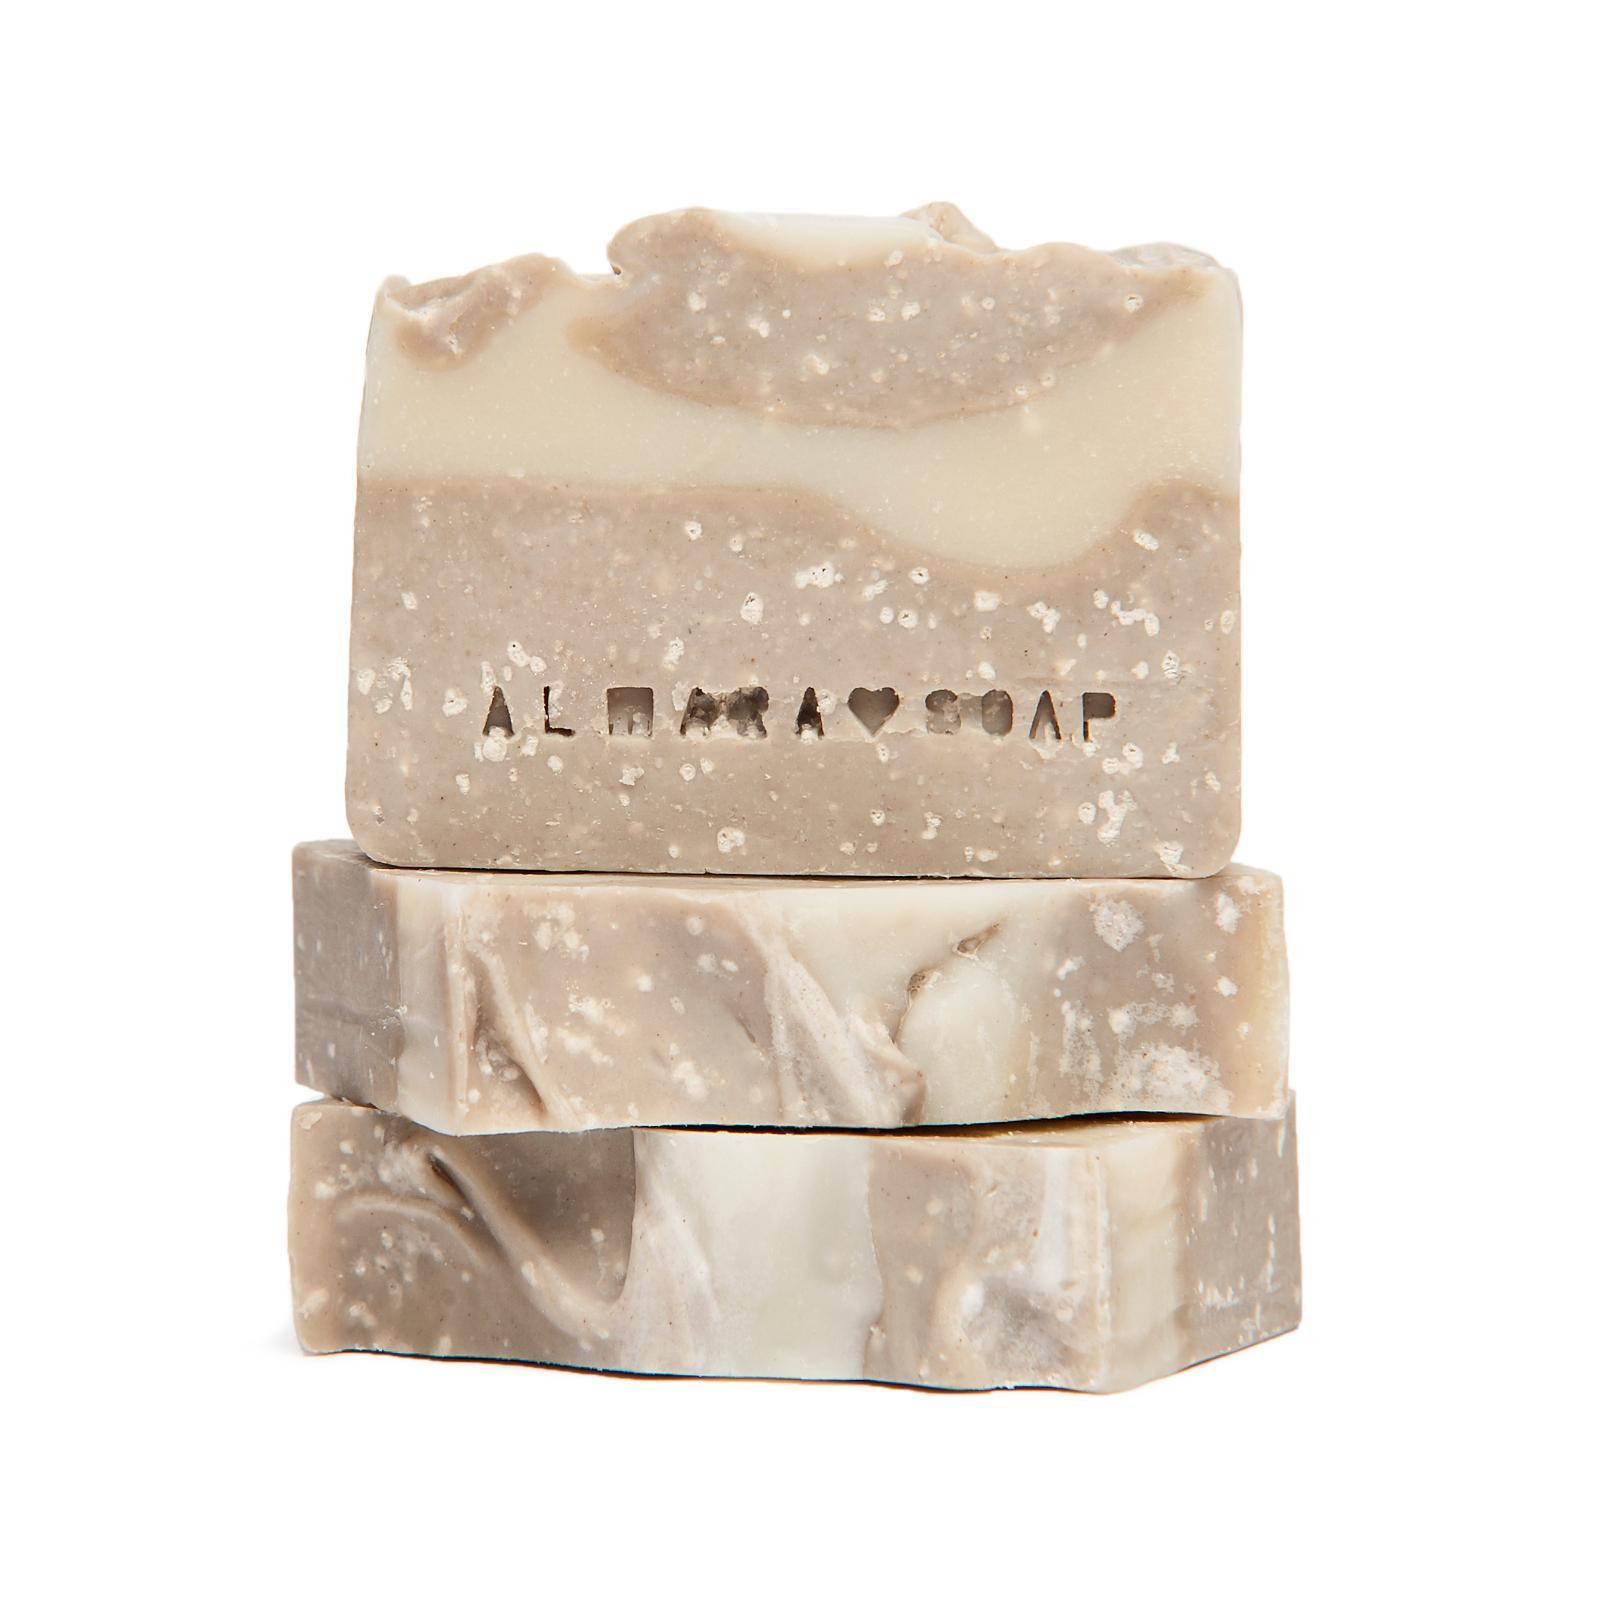 Almara Soap Mýdlo Dead Sea 90 ± 5 g